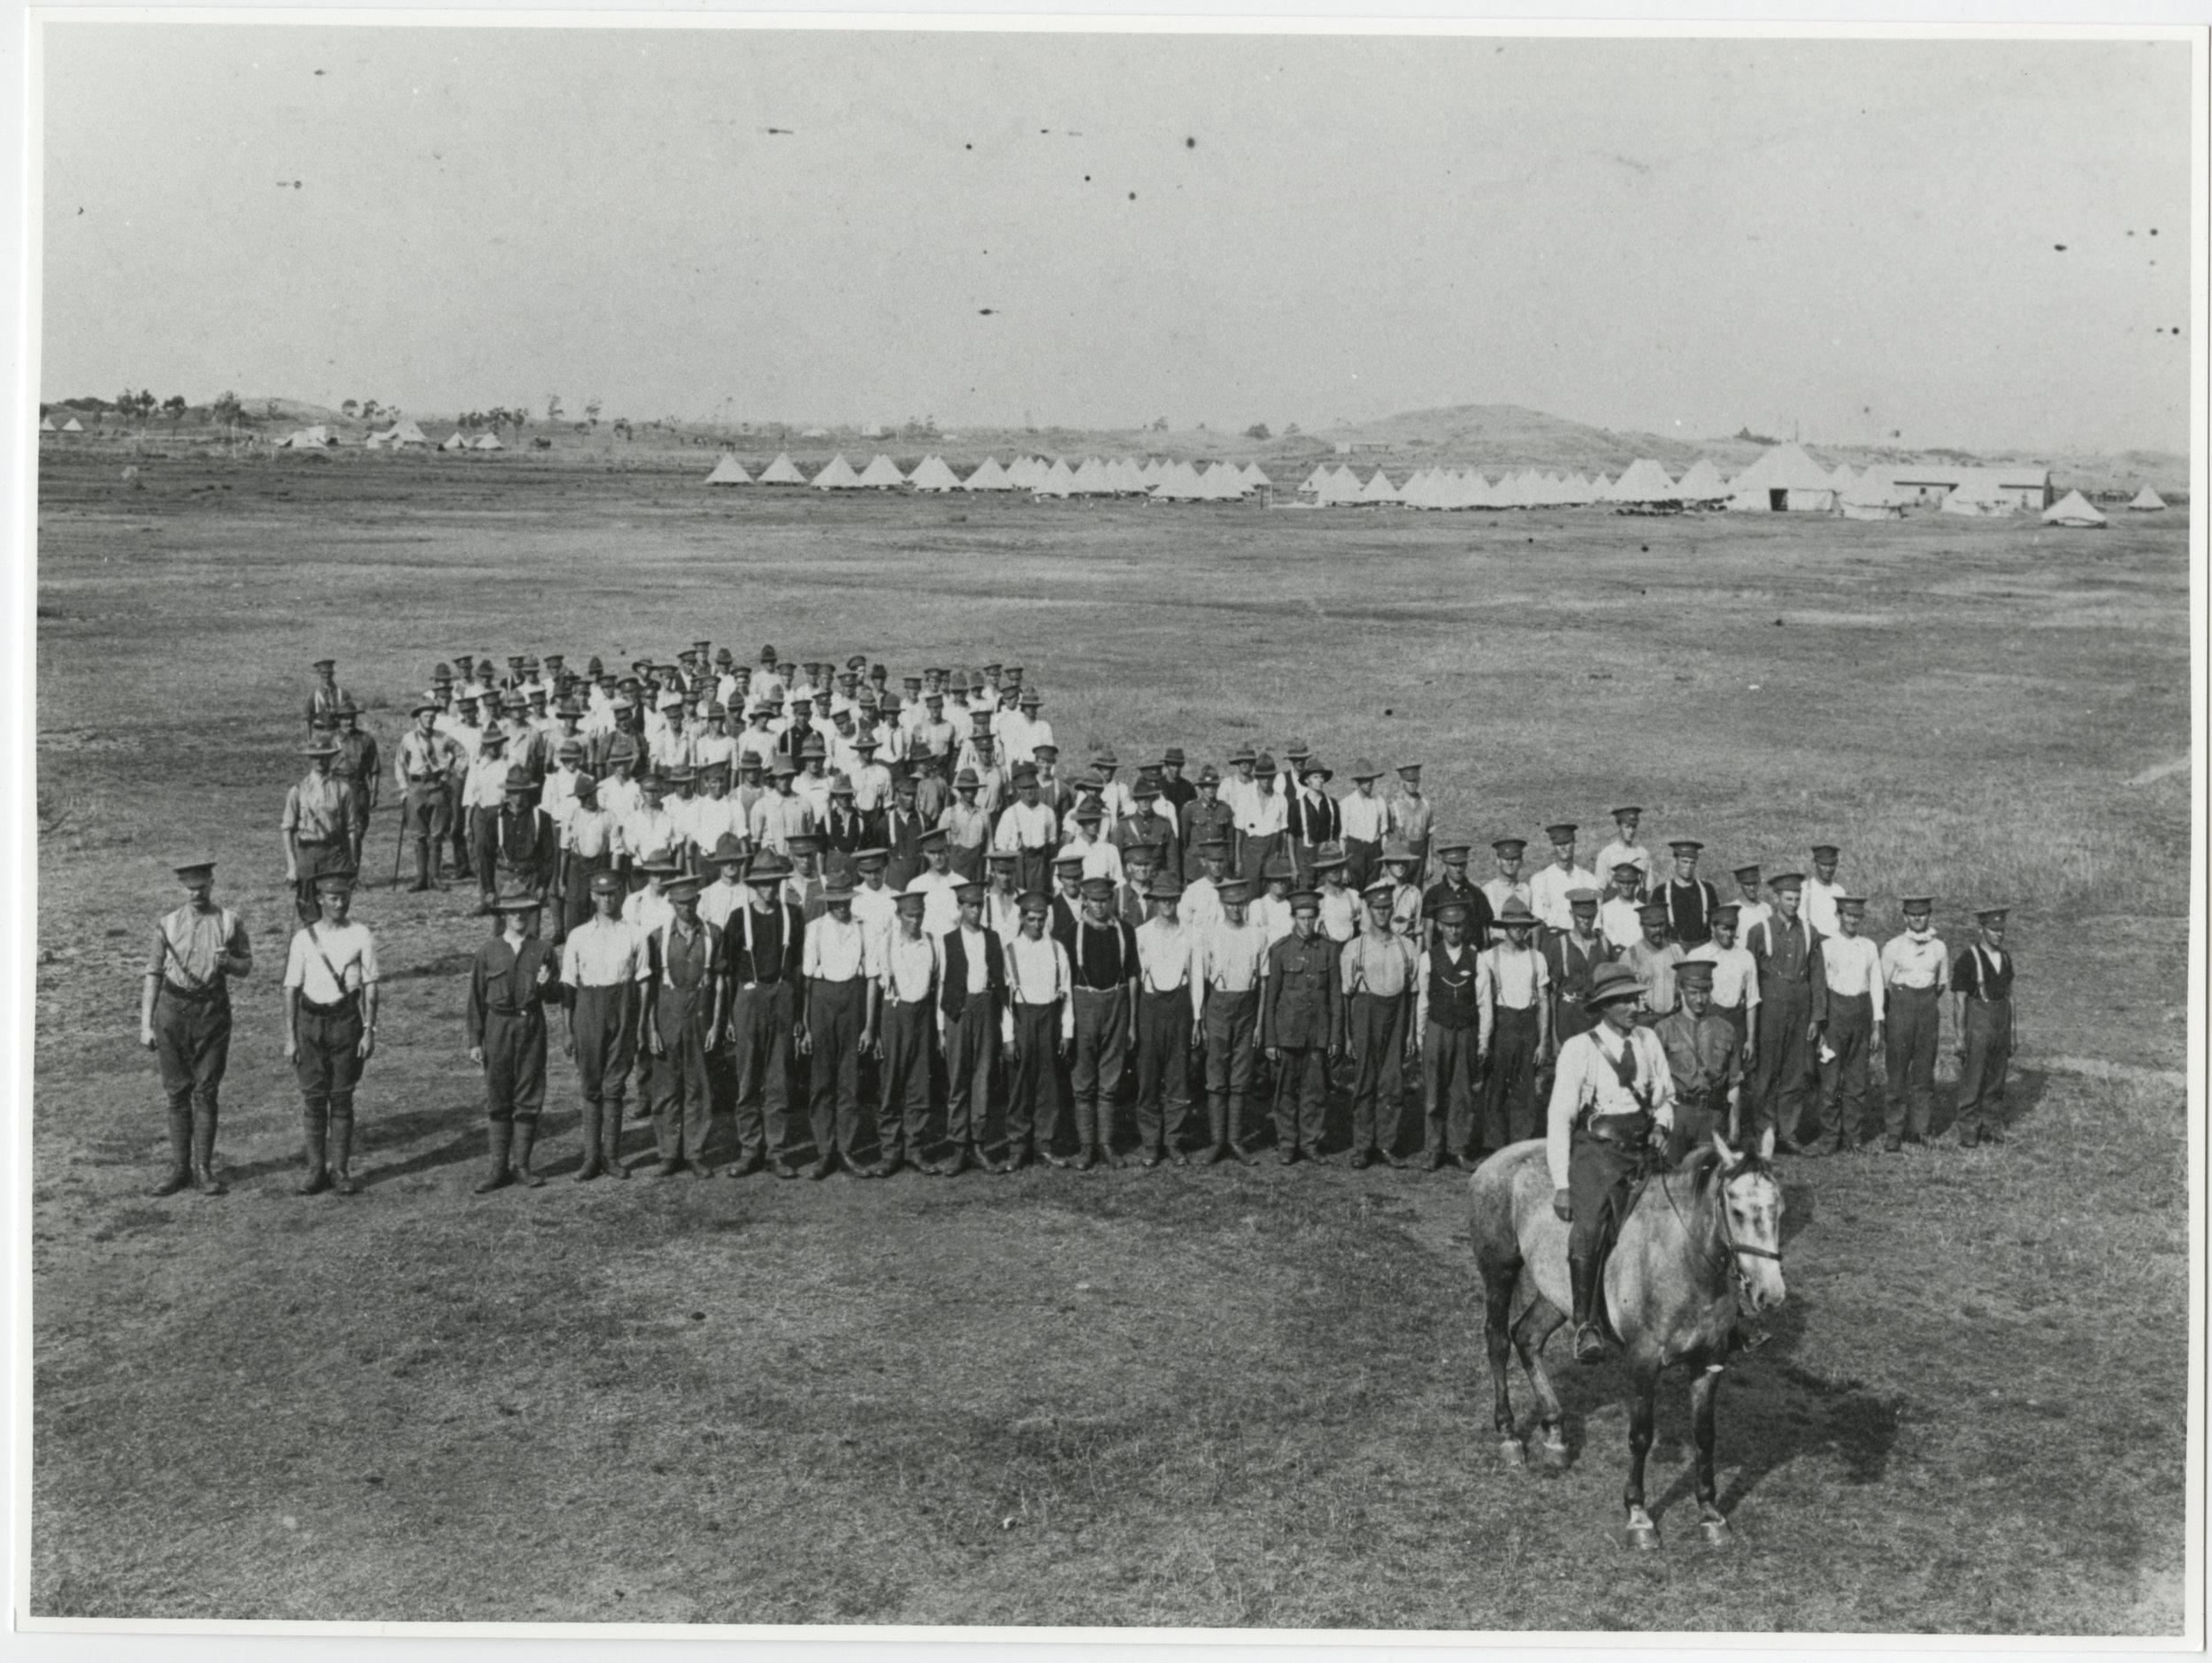 Rangiotuarmycamp1915-1916.jpg